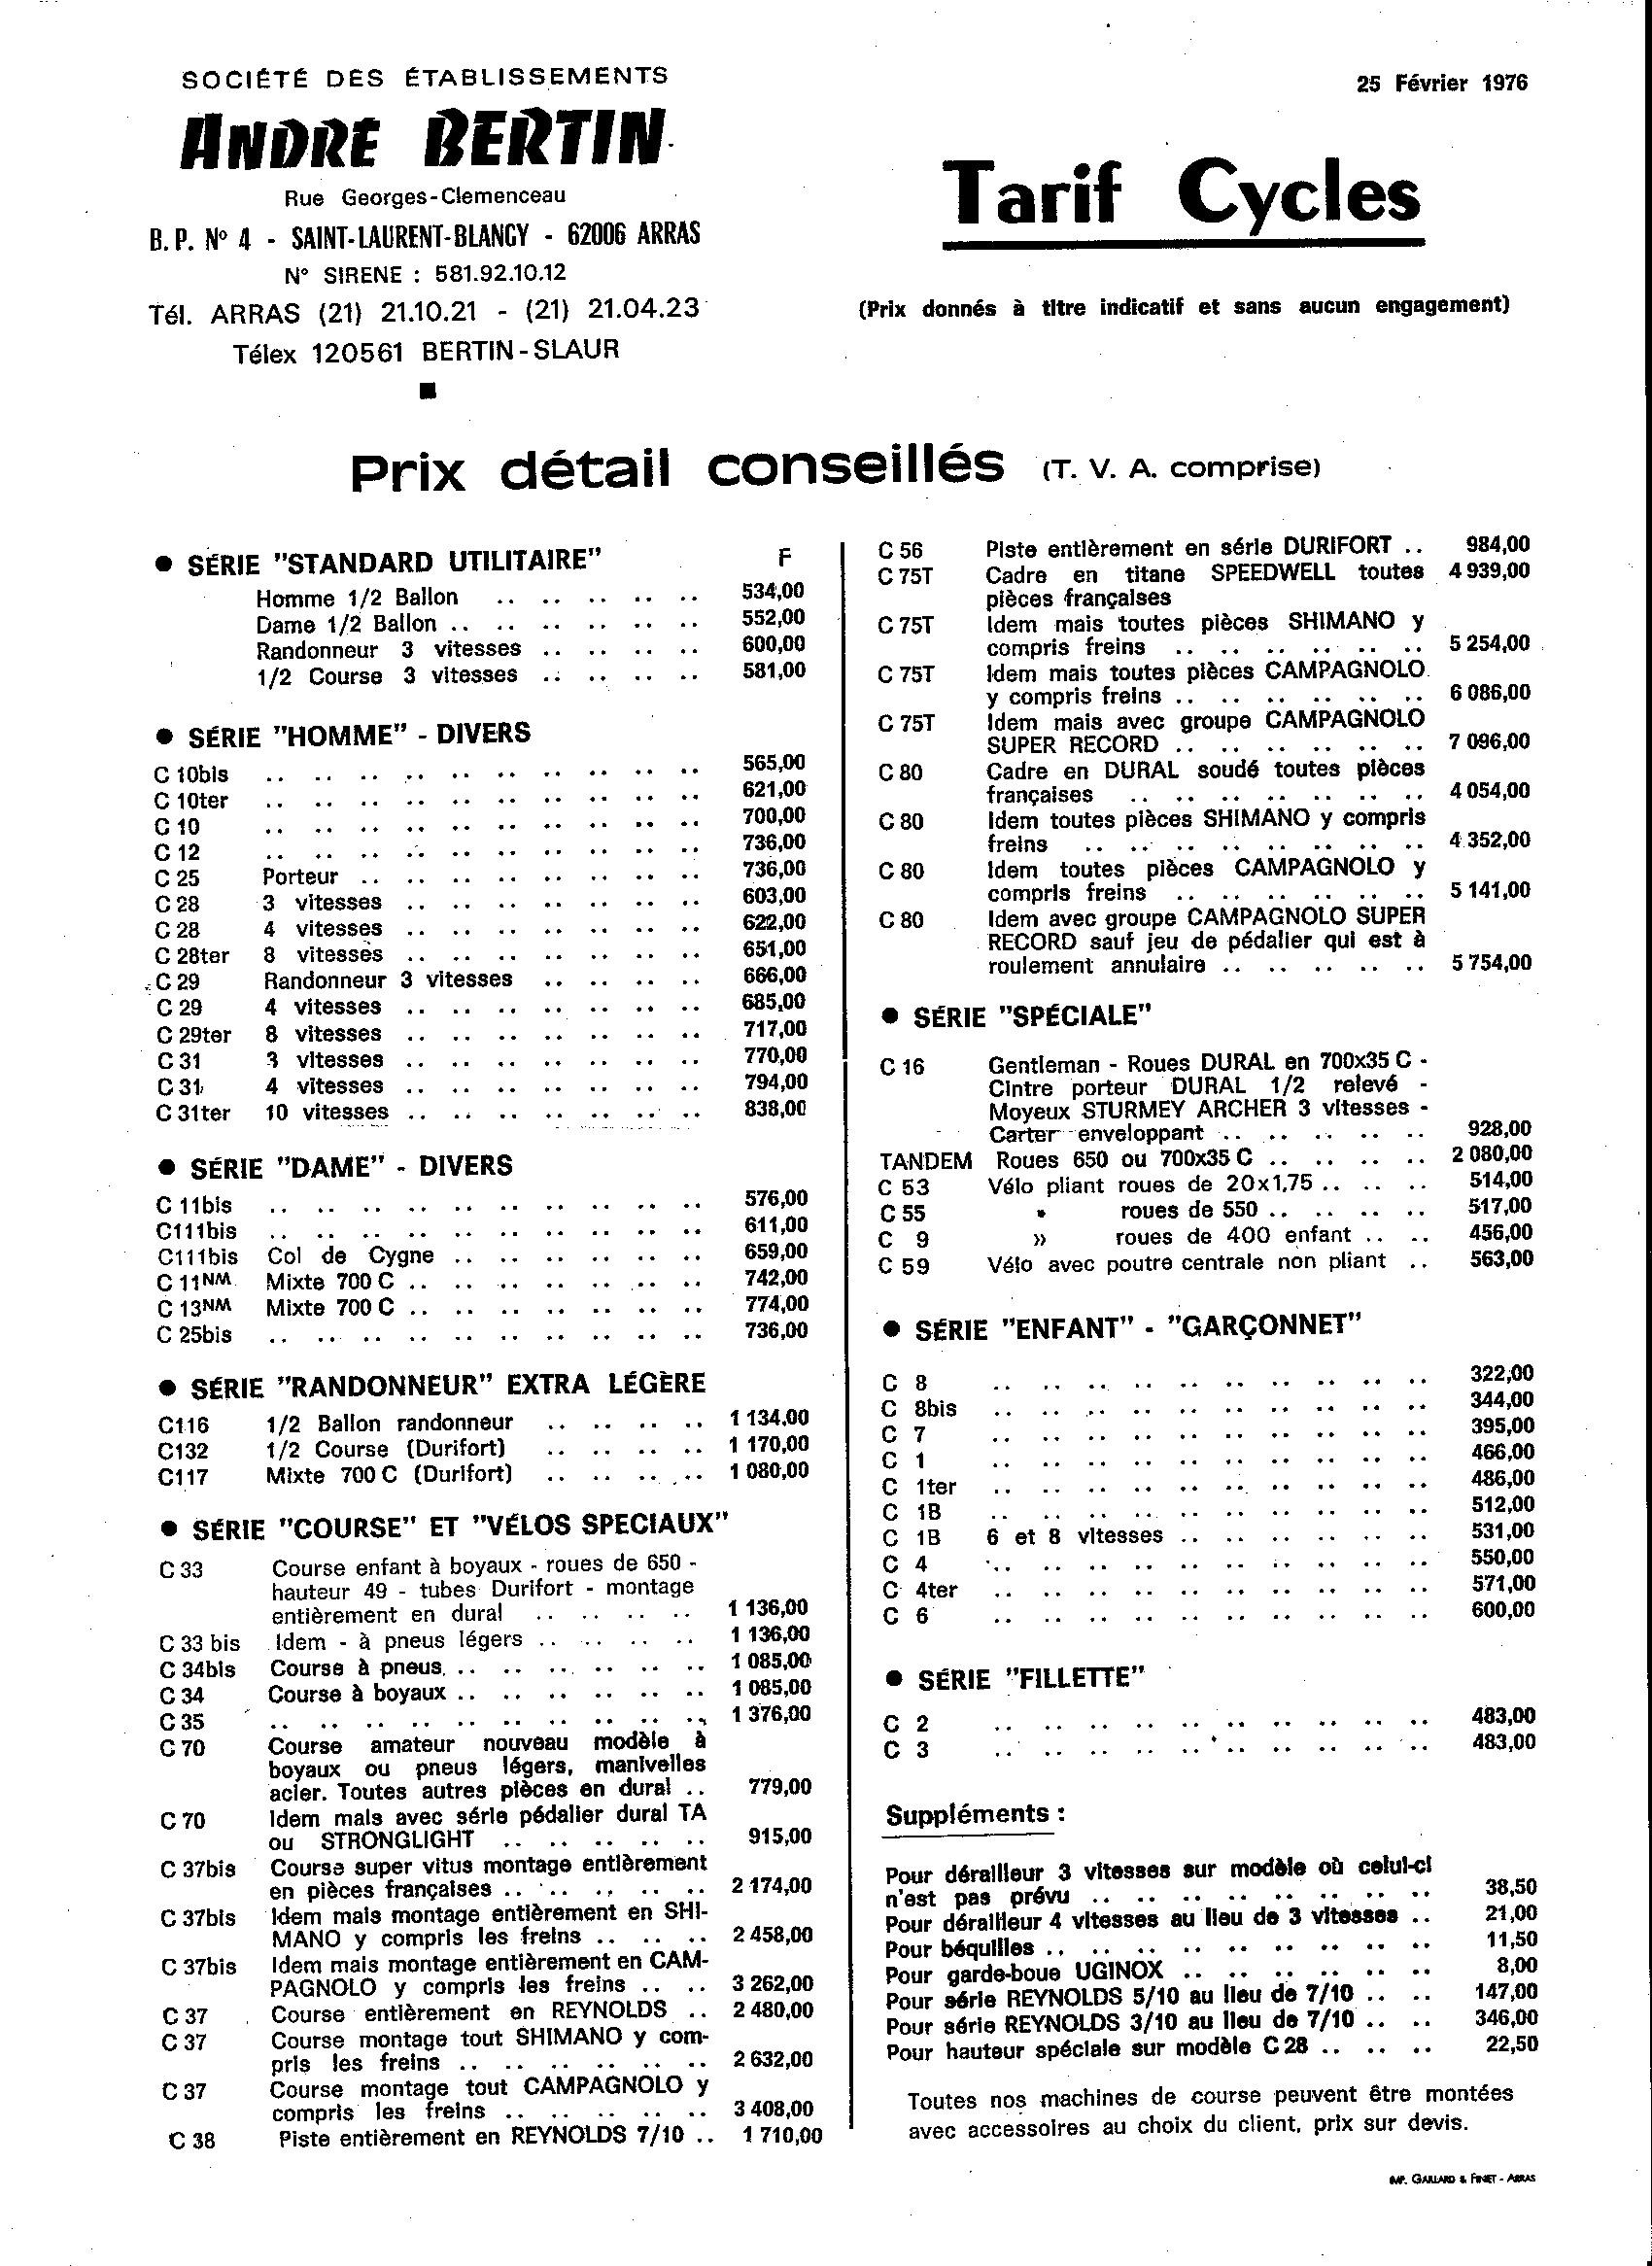 beauty price list template free